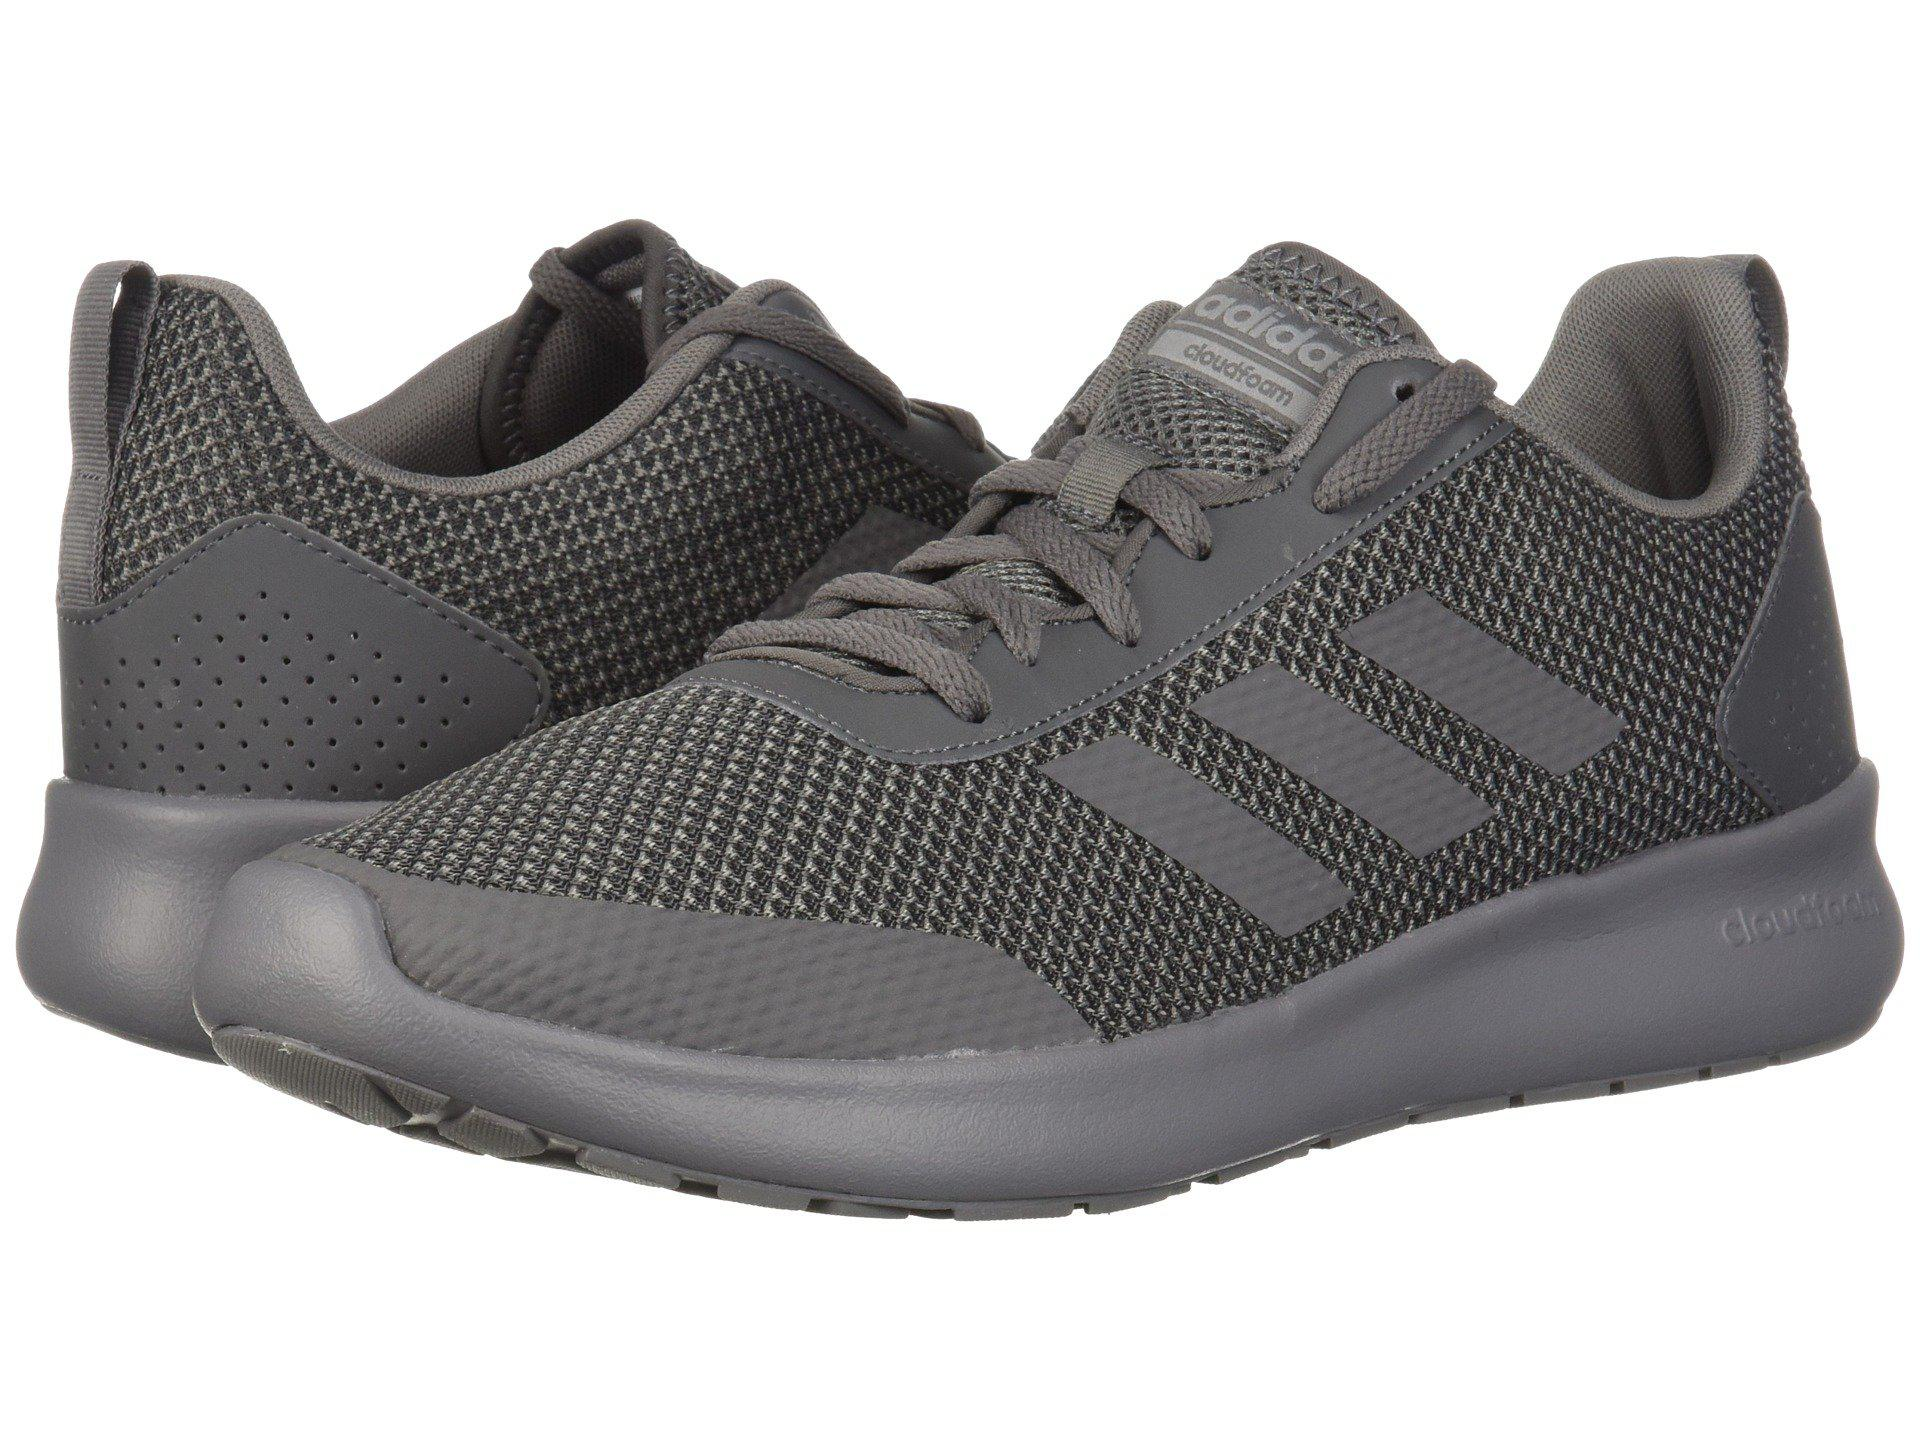 Lyst - adidas Cloudfoam Element Race in Gray for Men e8d3c095506e9